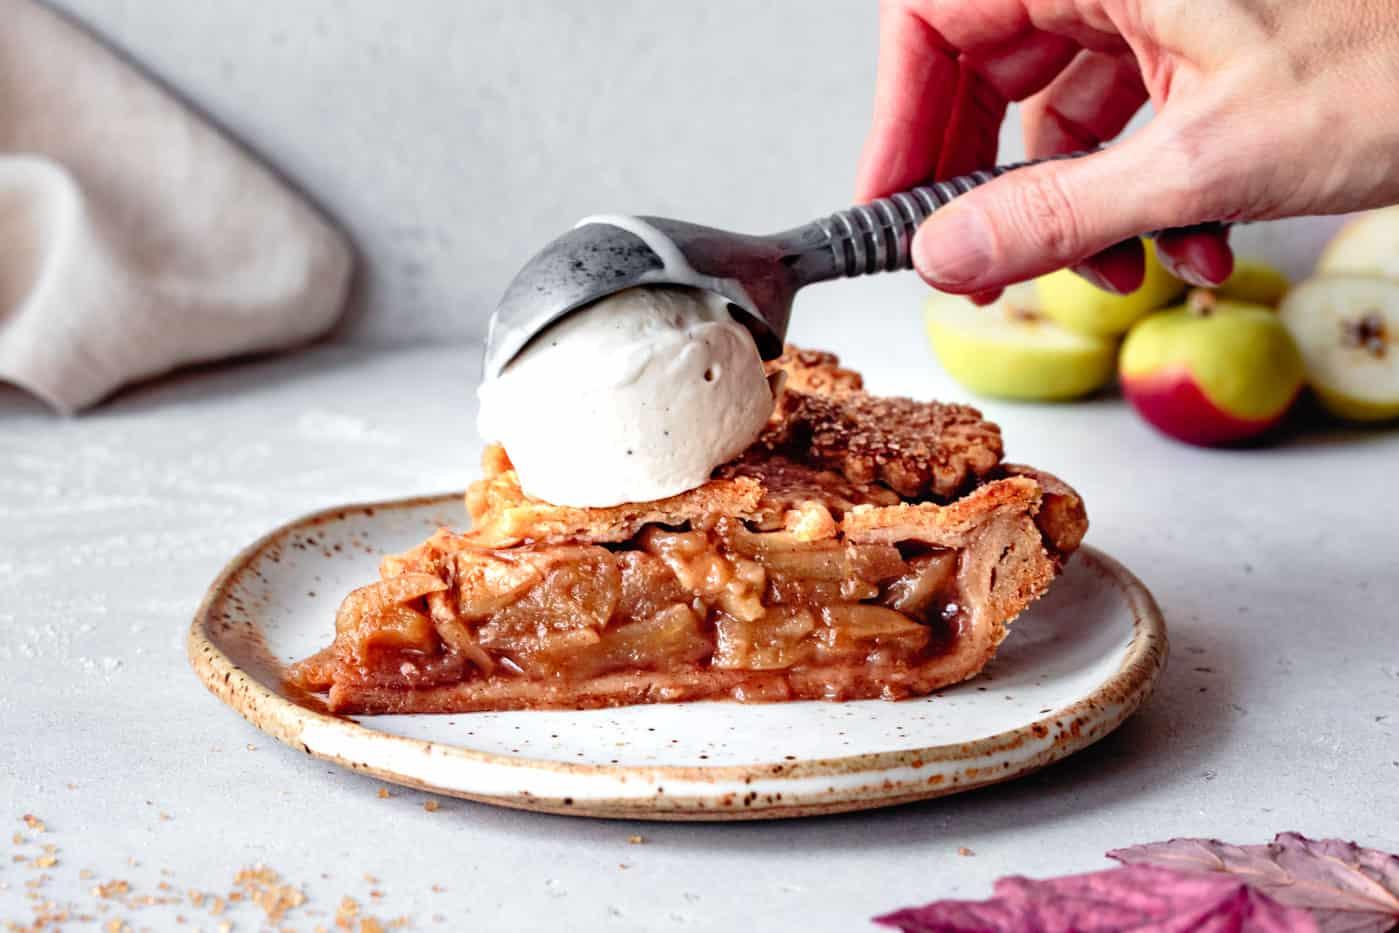 putting ice cream atop a slice of gluten-free apple pie